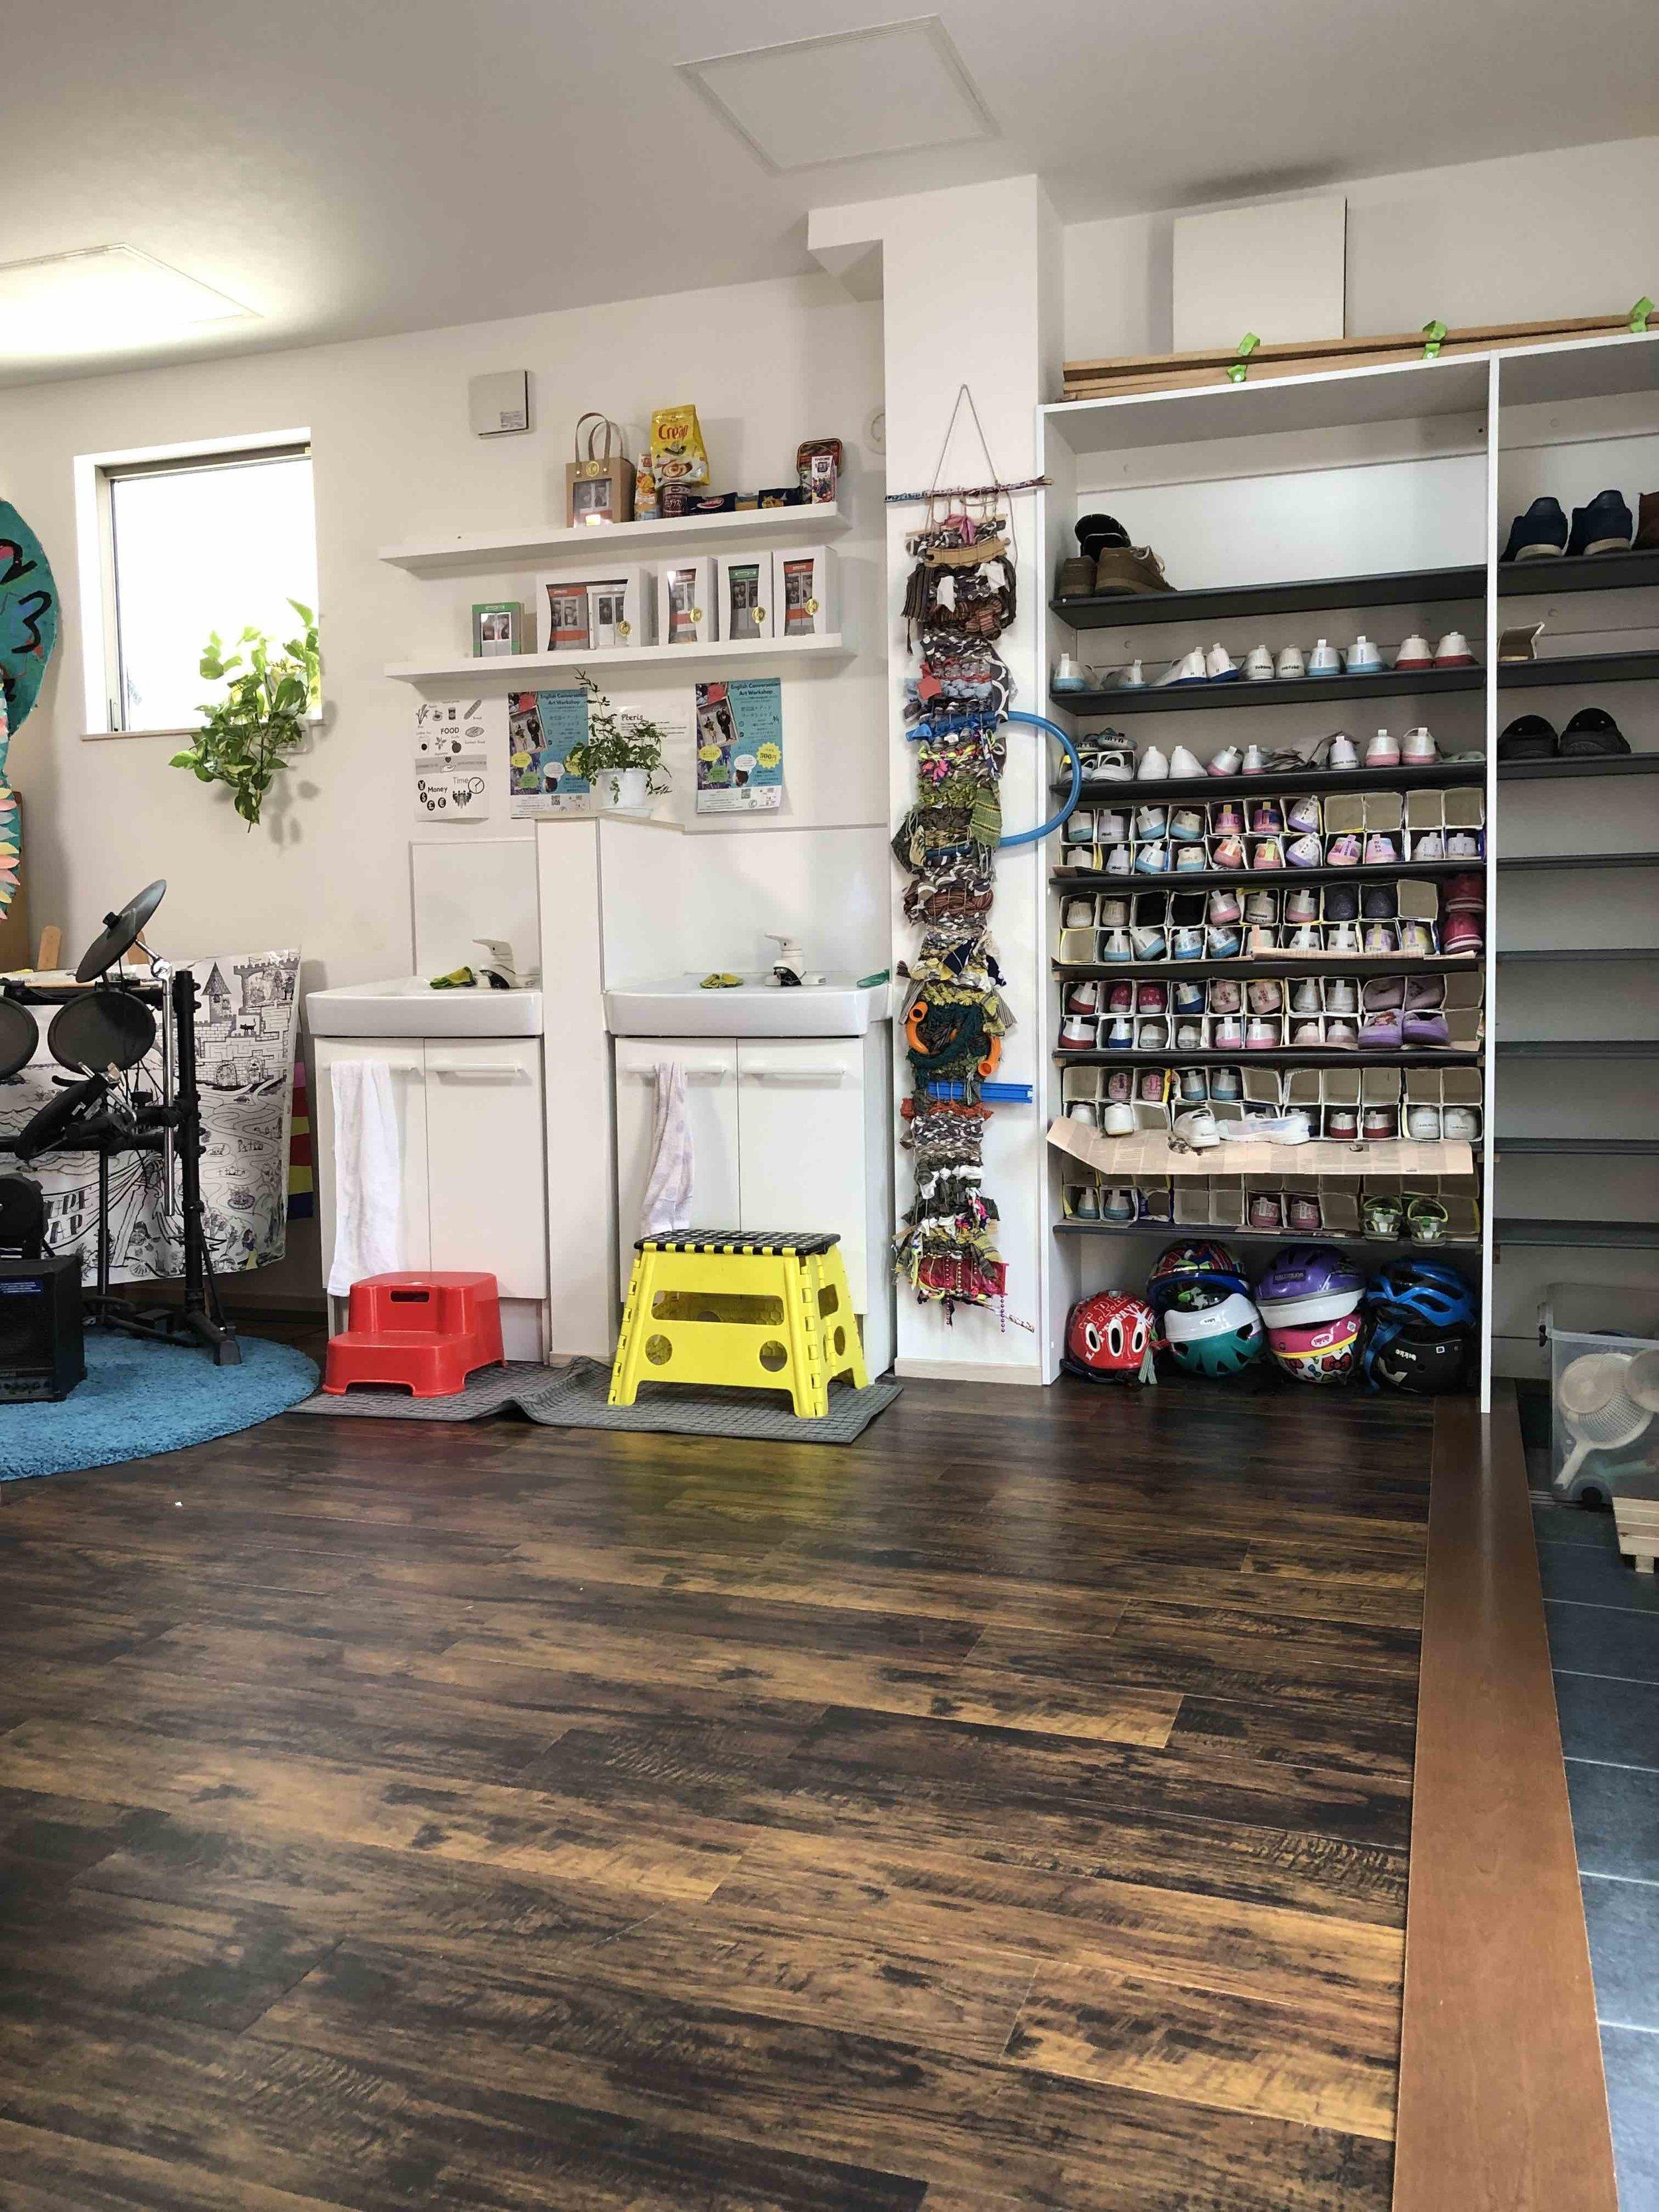 Shoe box / In house Charity Workshop store  靴箱 / チャリティー英会話ワークショップの店舗